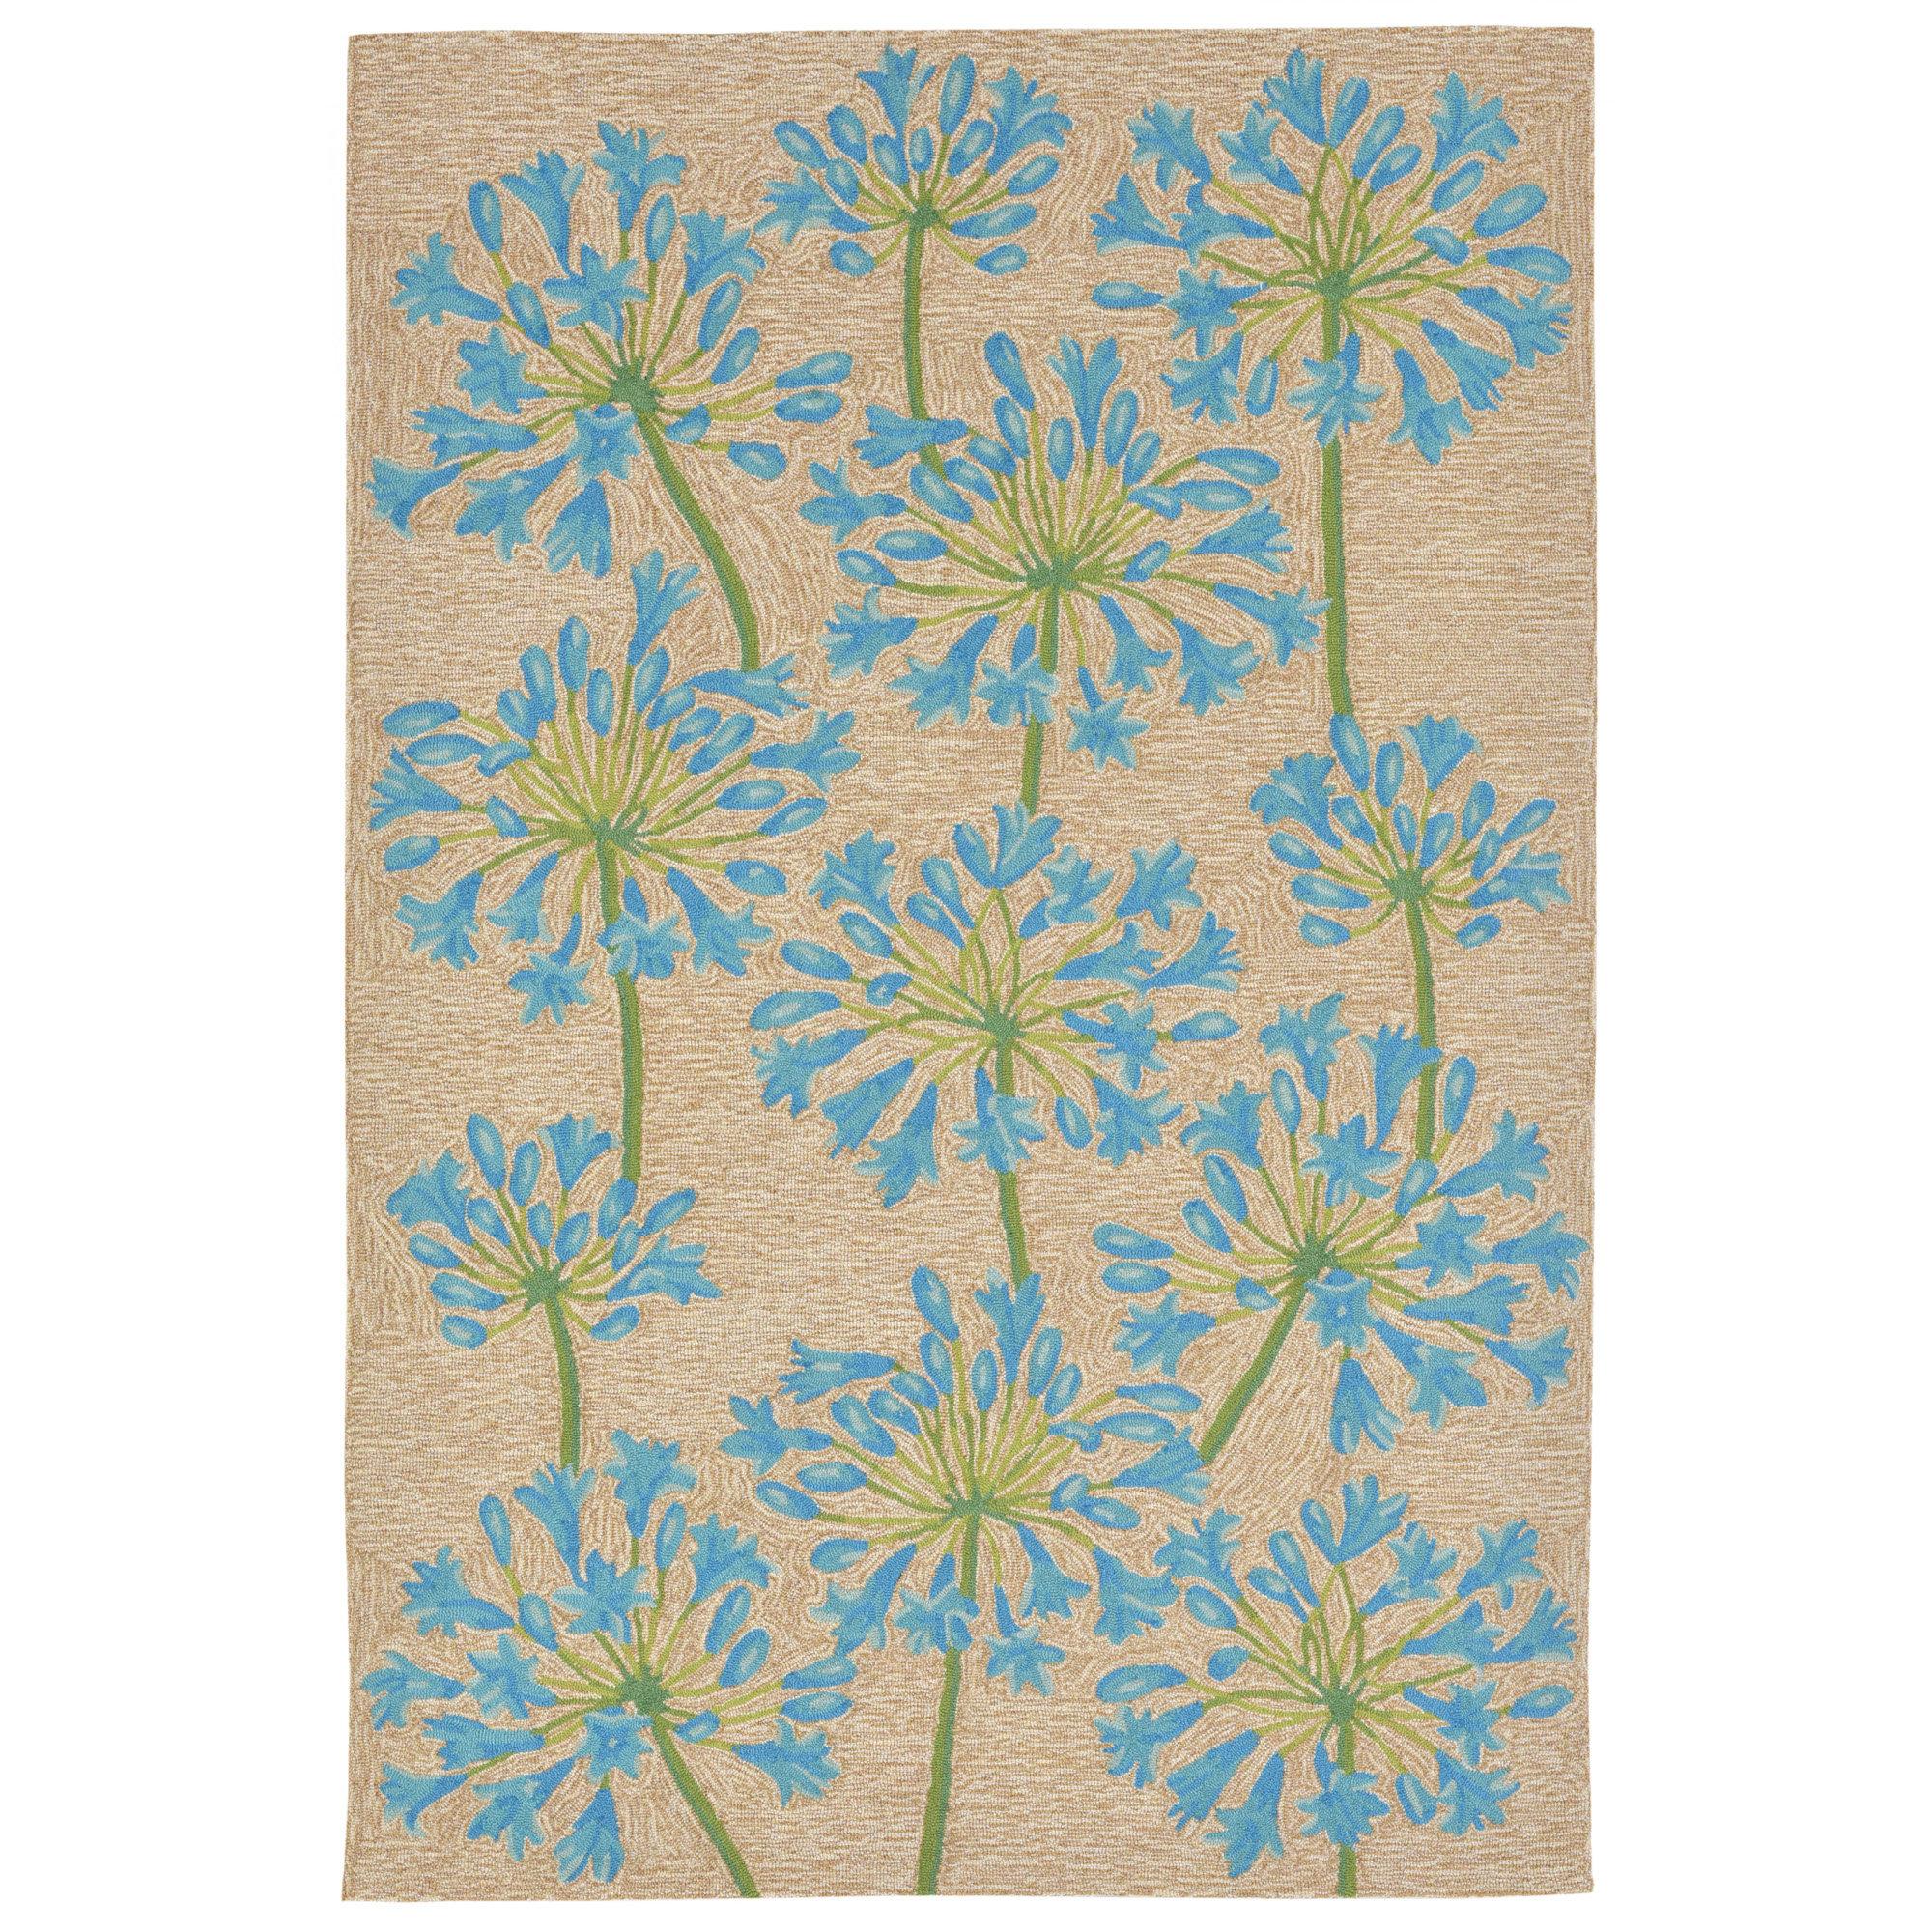 August Grove Dazey Lily Hand Tufted Beige Blue Indoor Outdoor Area Rug Reviews Wayfair